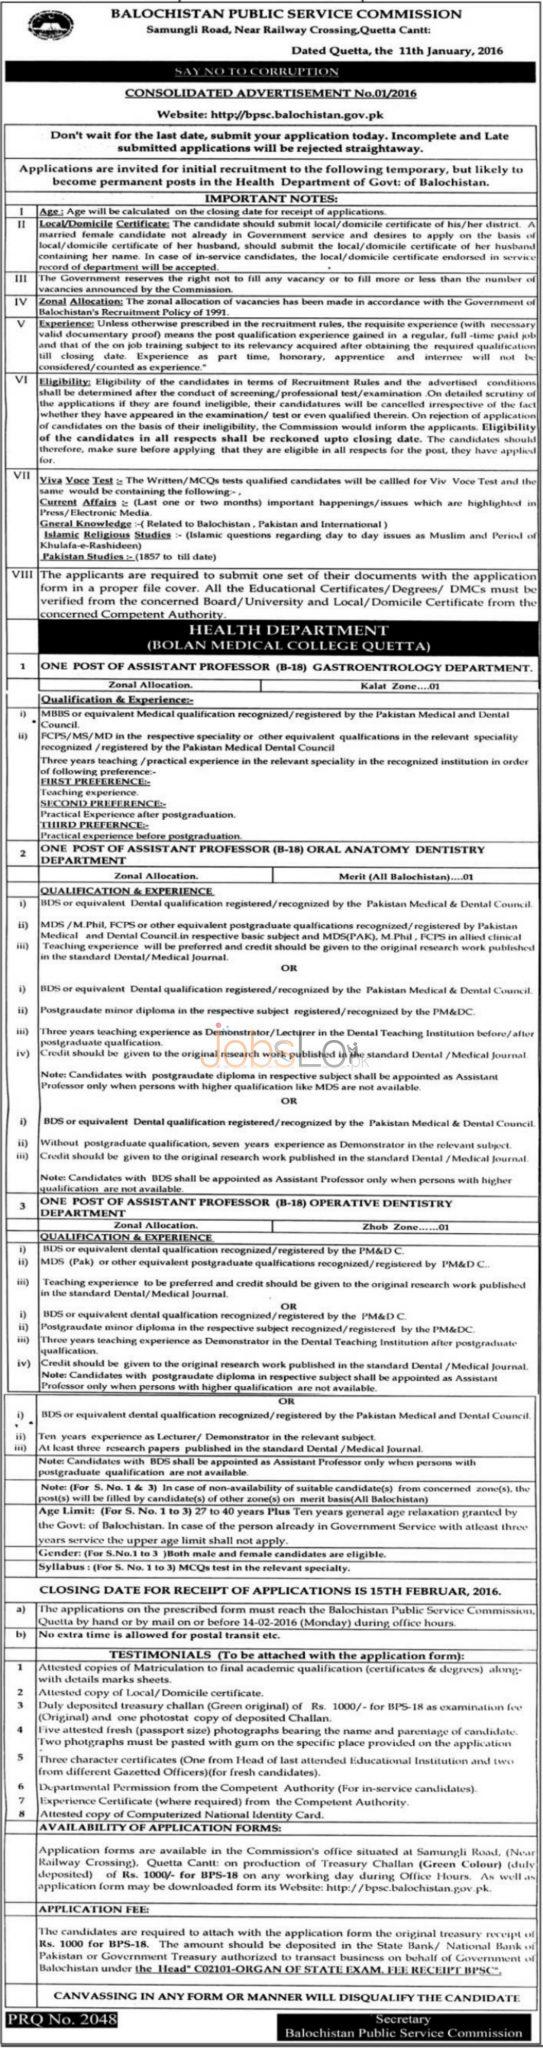 Recruitment Offer in Balochistan Public Service Commission Health Department